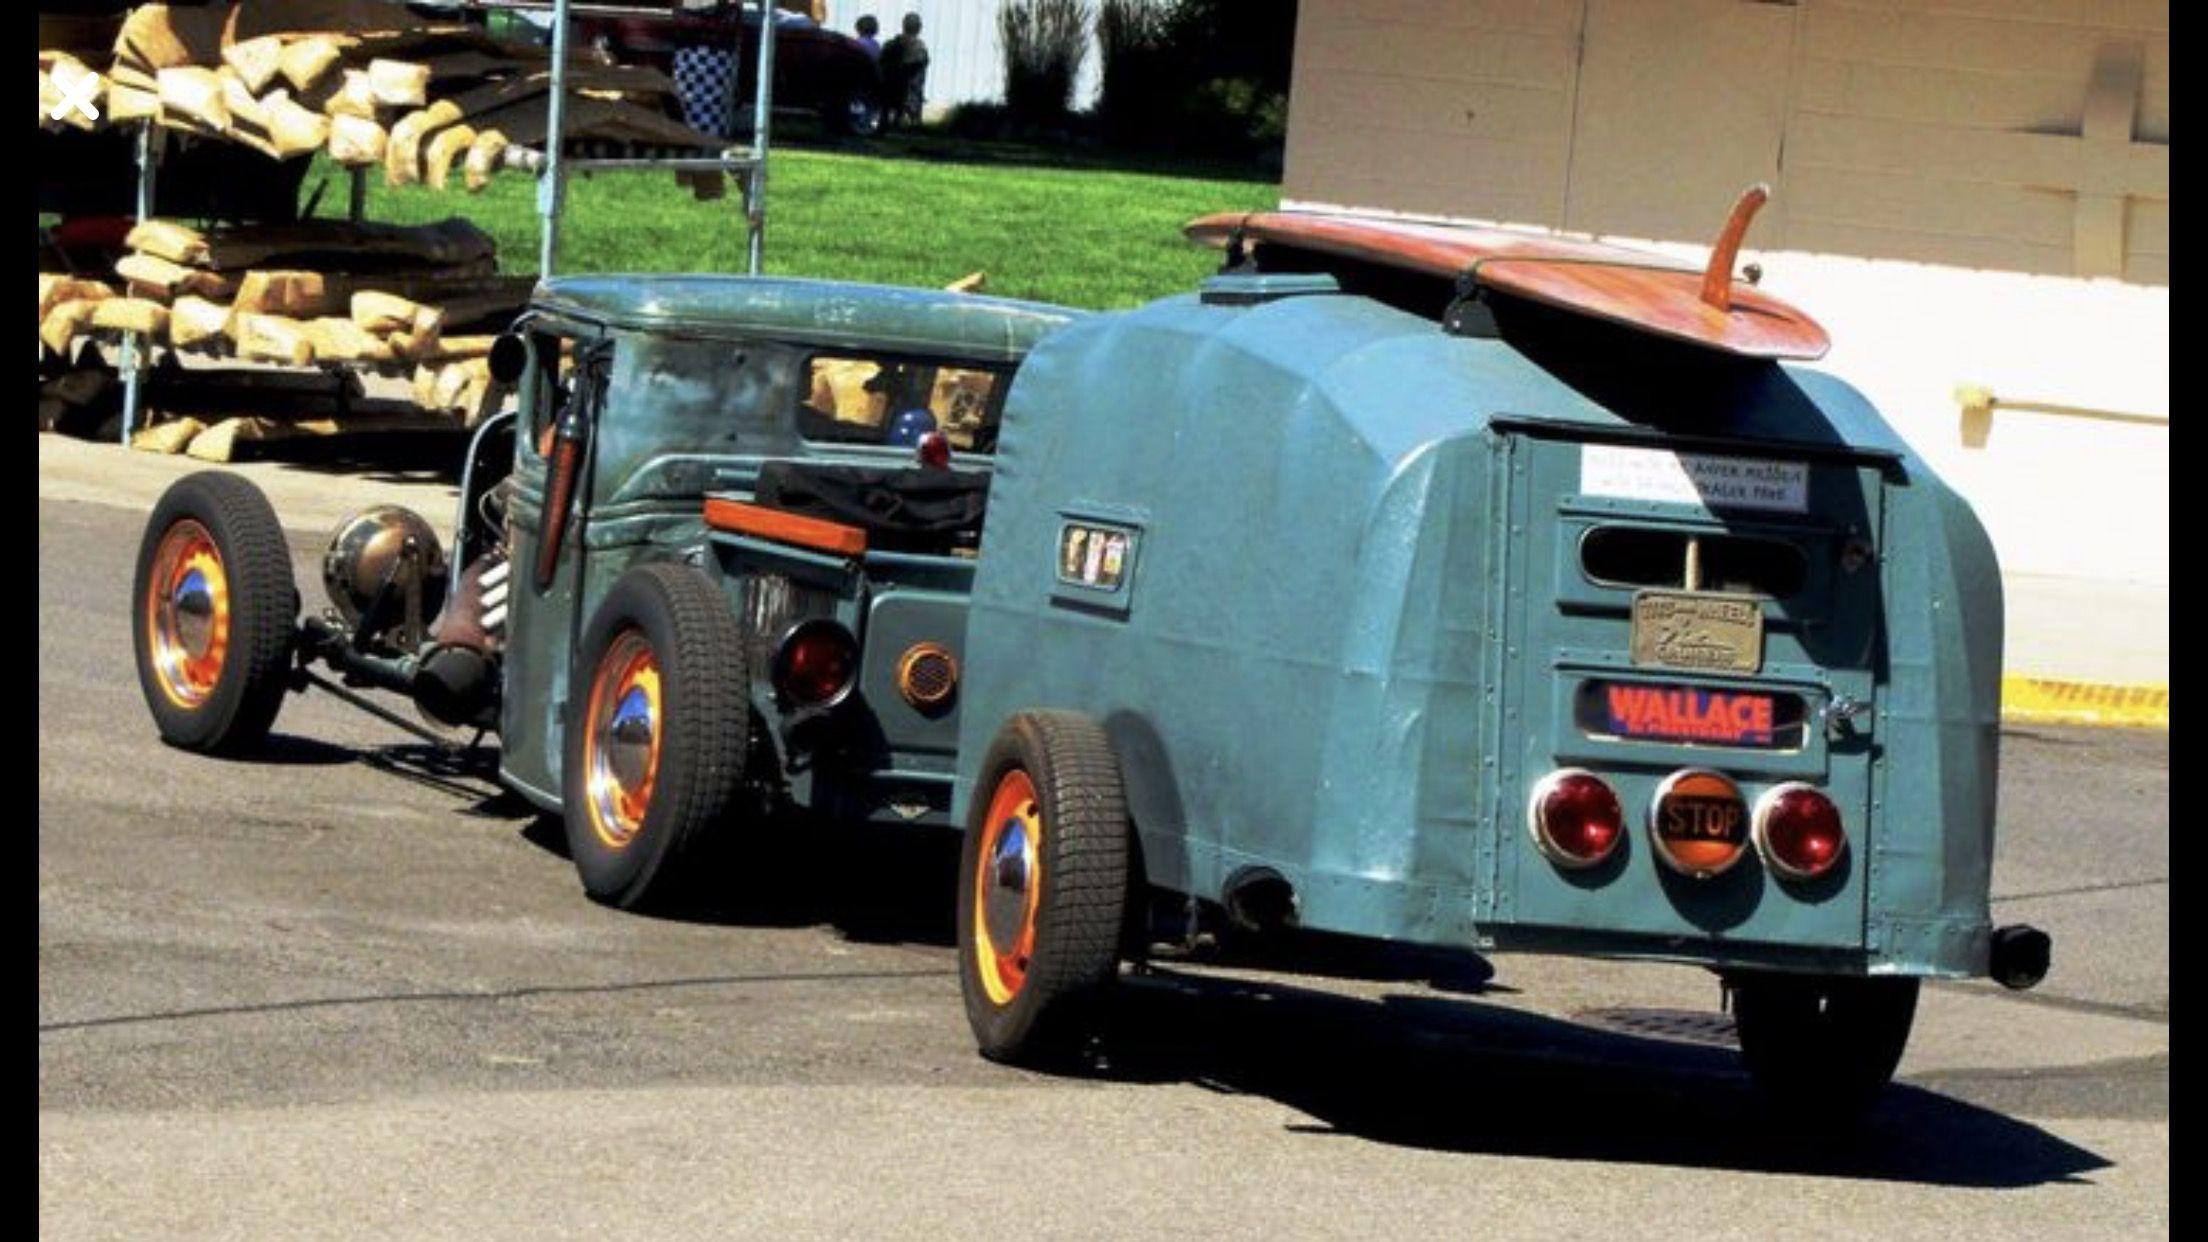 Pin de Pete Stephens en Vehicles and campers | Pinterest